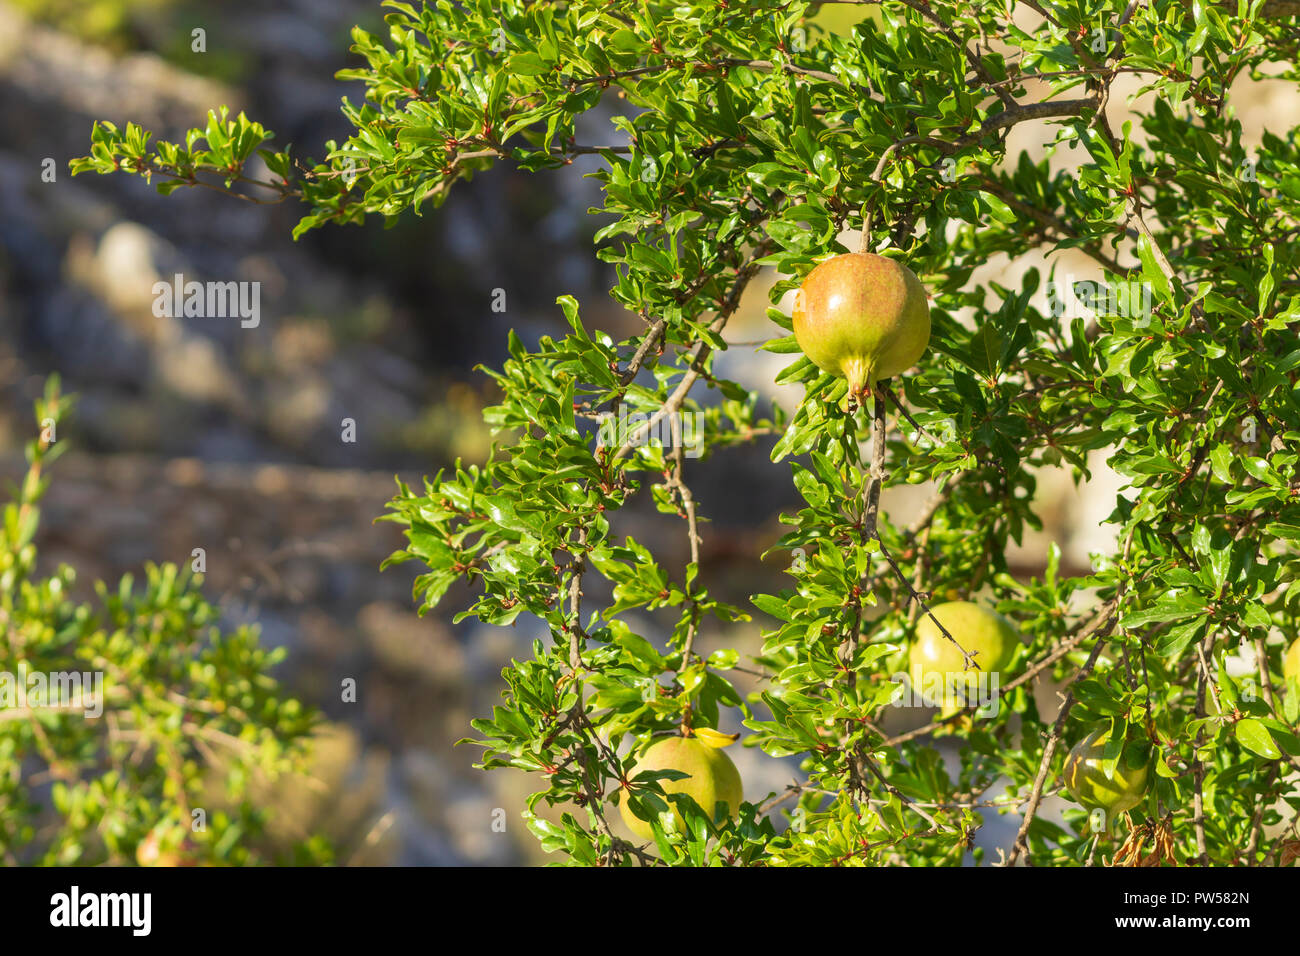 Punica granatum, Pomegranate fruit ripening in the sun, August, Spain - Stock Image